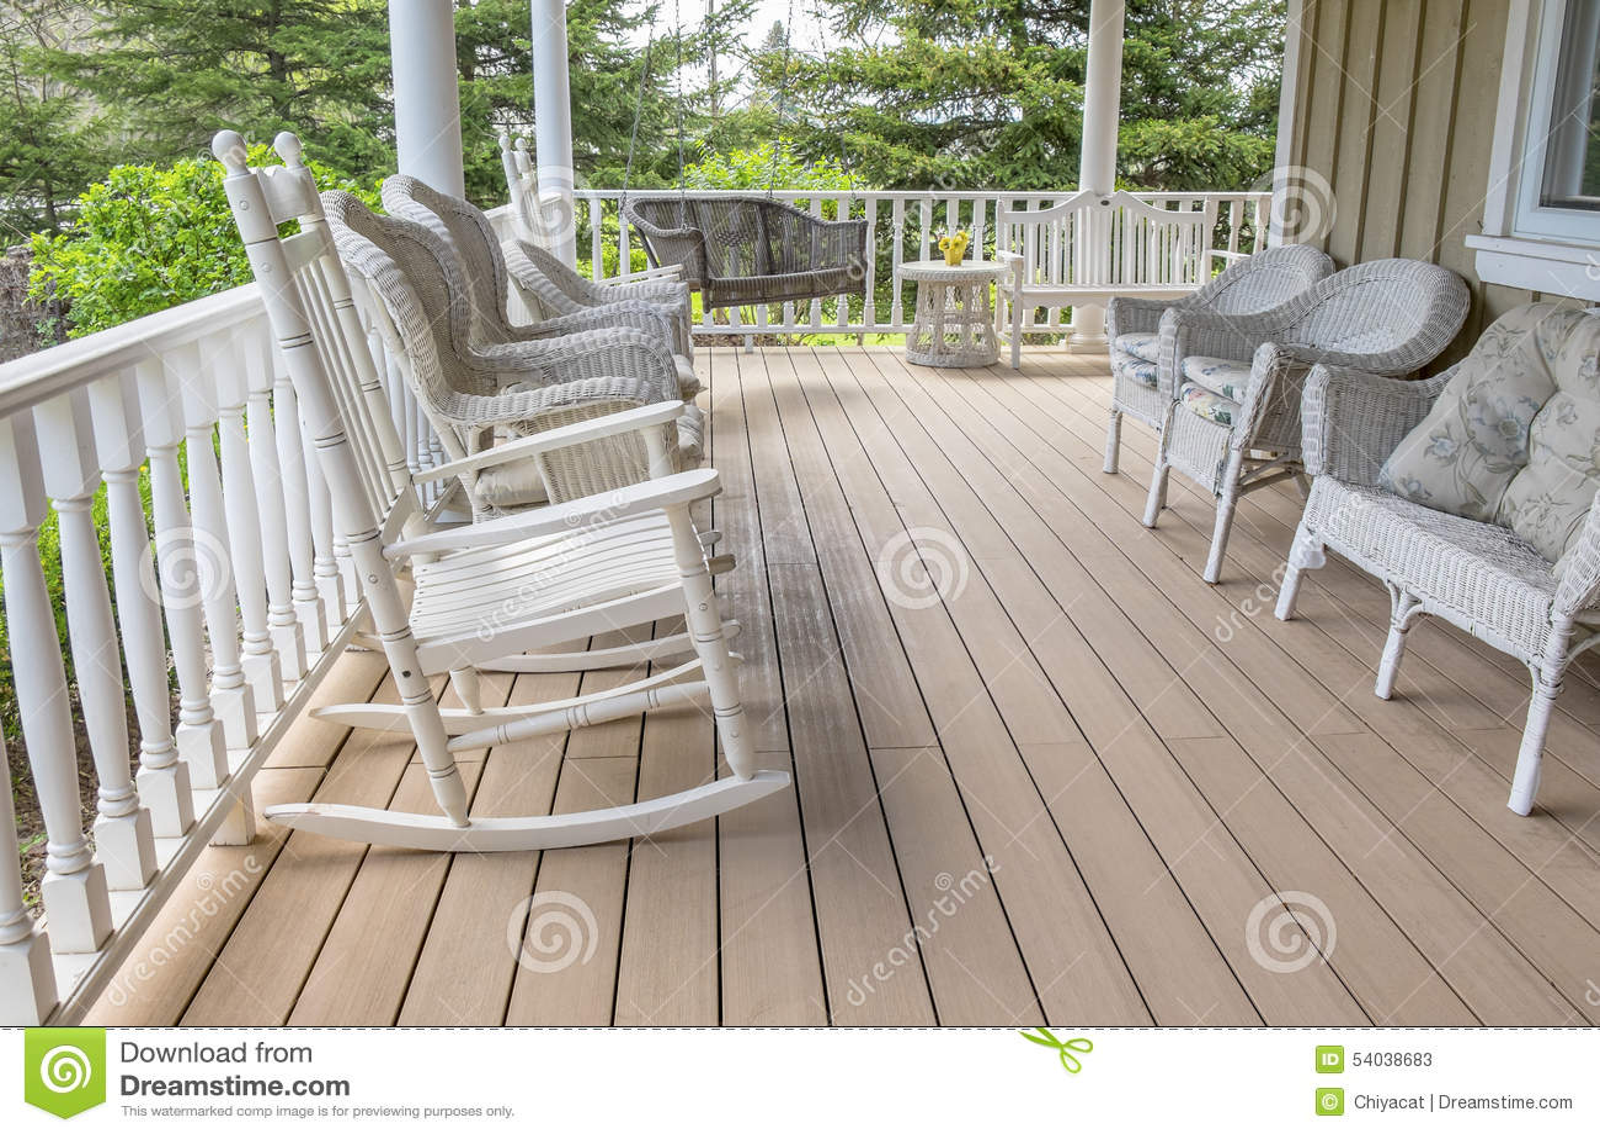 veranda chair design oversized zero gravity filled with white wicker furniture stock image